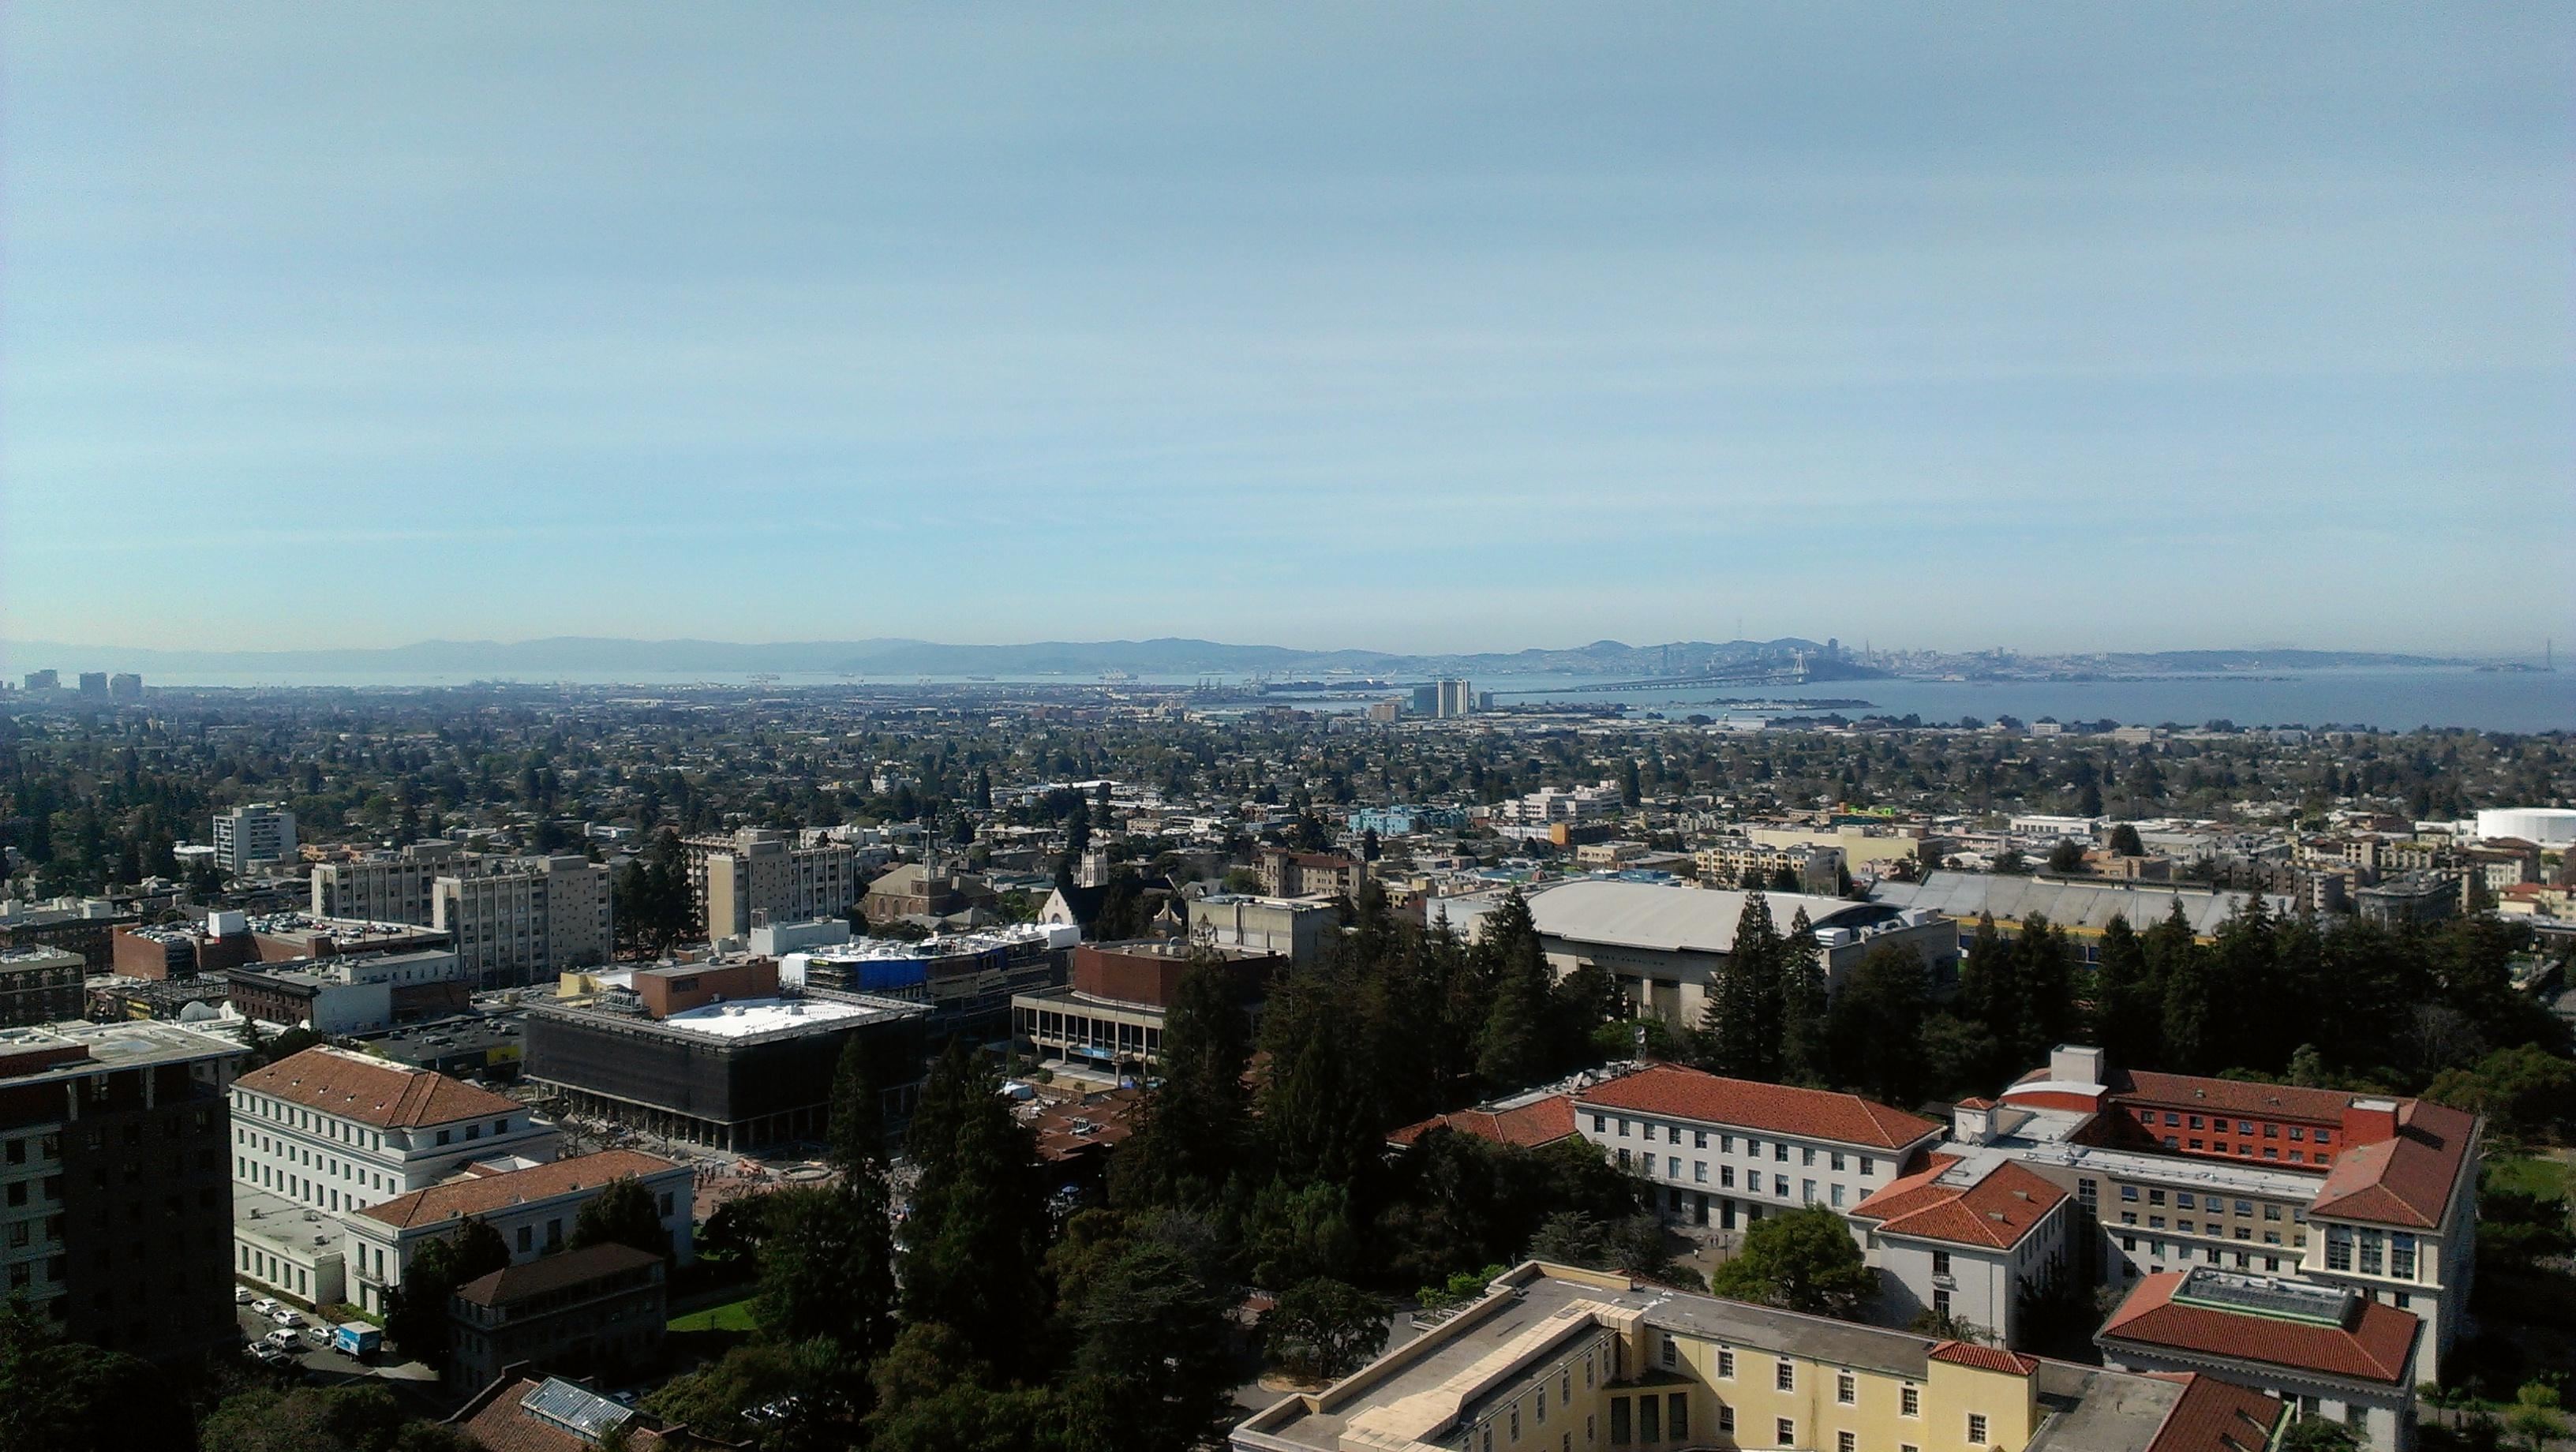 Uc Berkeley Student Study Of Economic Chat Room